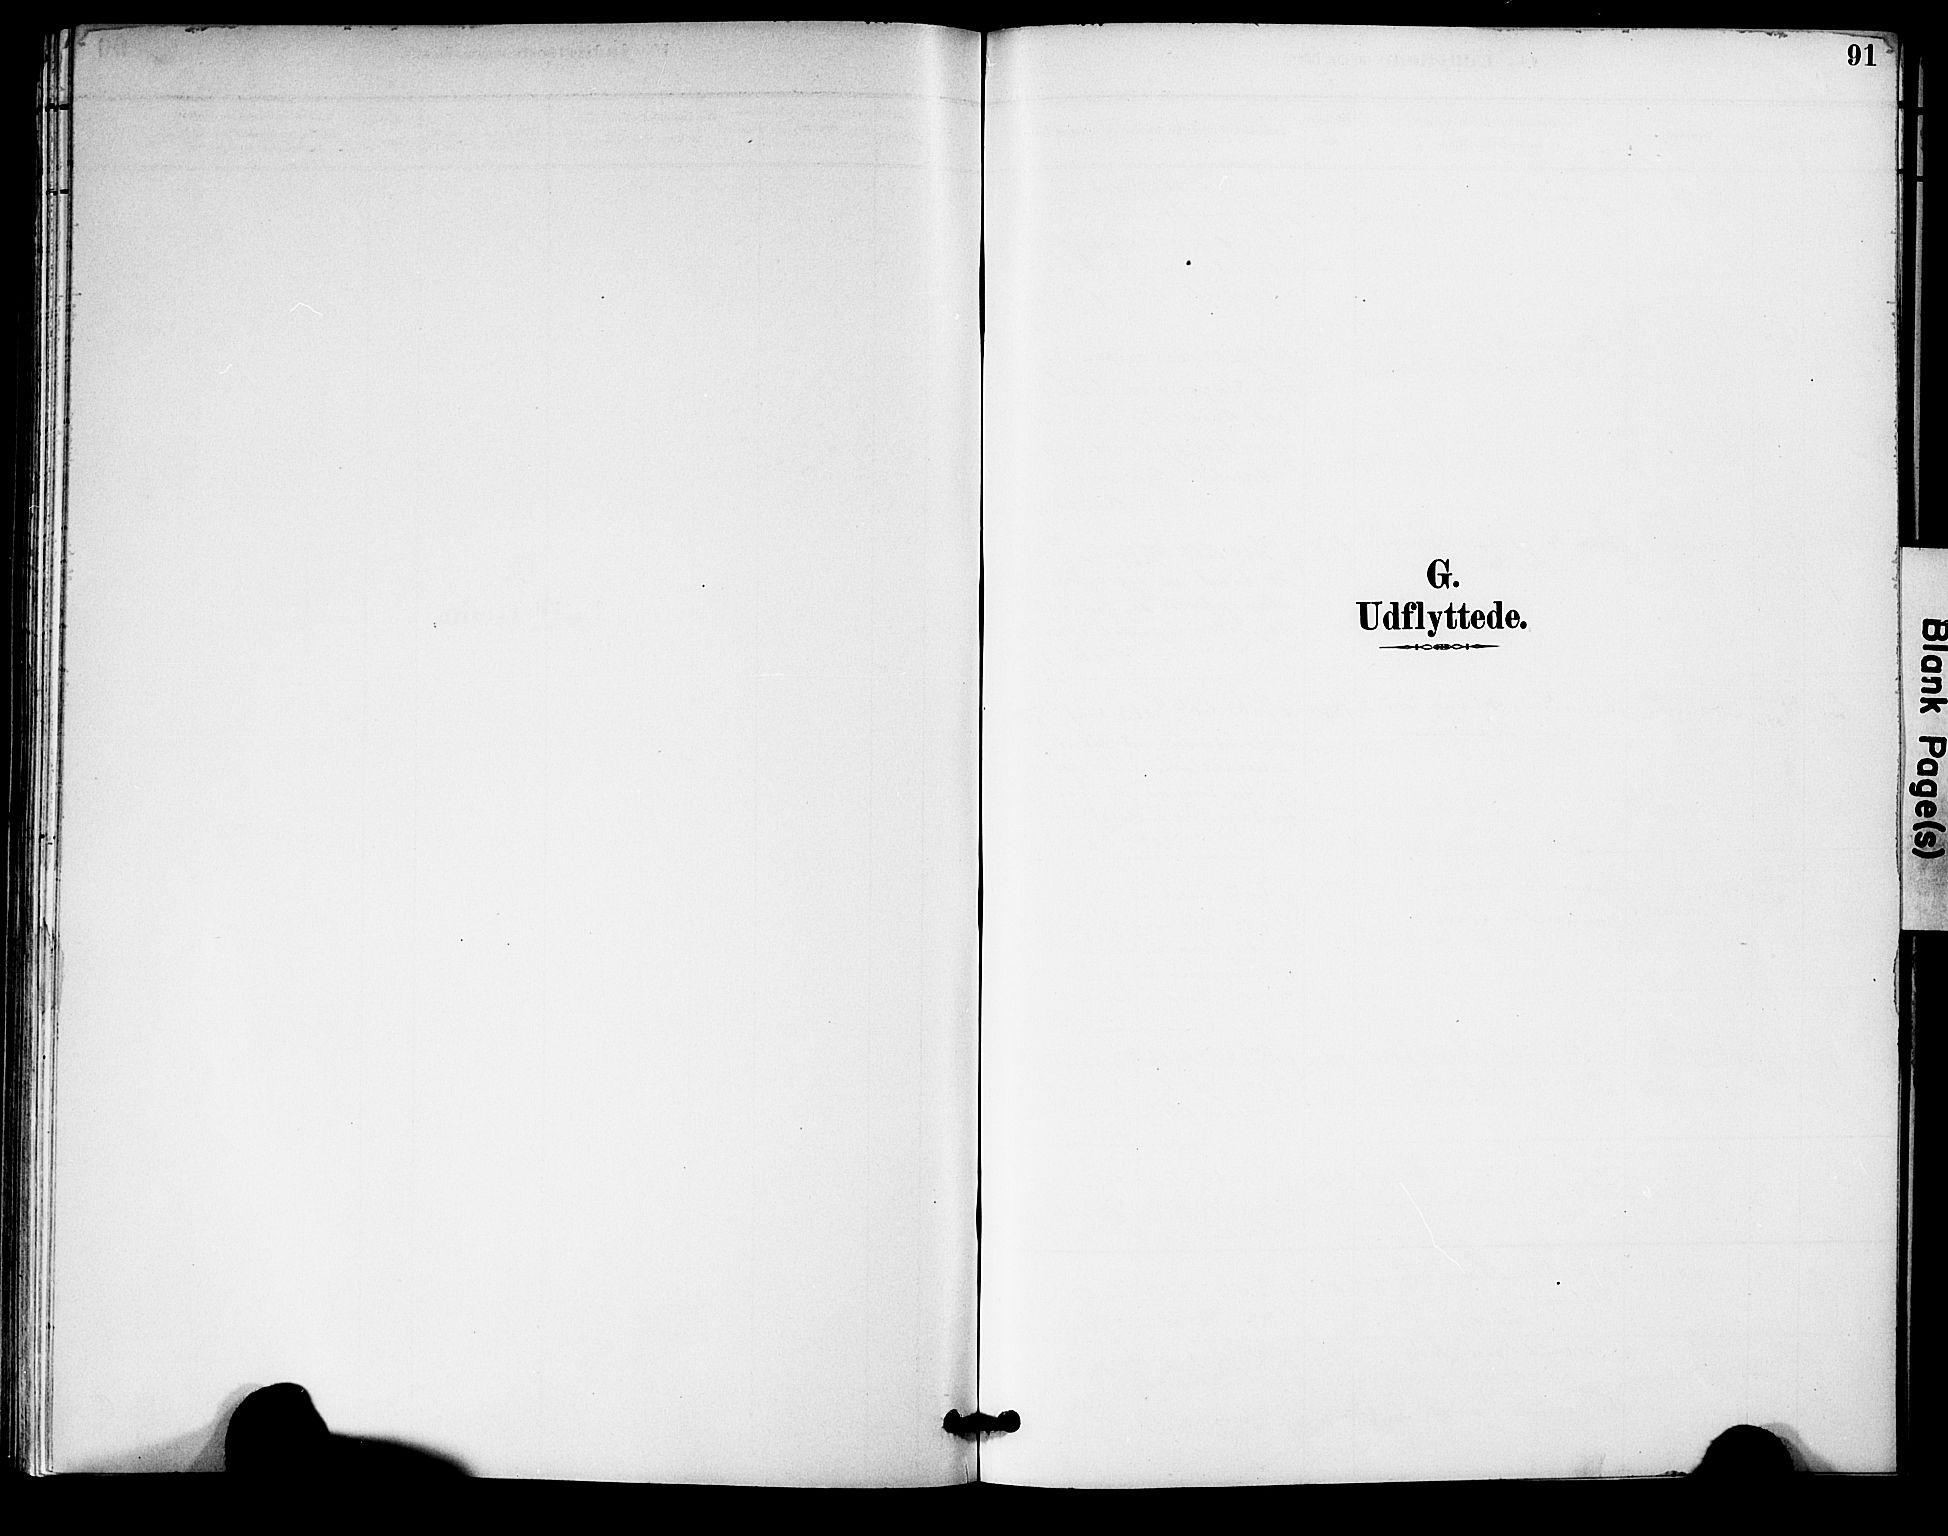 SAK, Bygland sokneprestkontor, F/Fa/Fac/L0001: Ministerialbok nr. A 1, 1885-1909, s. 91